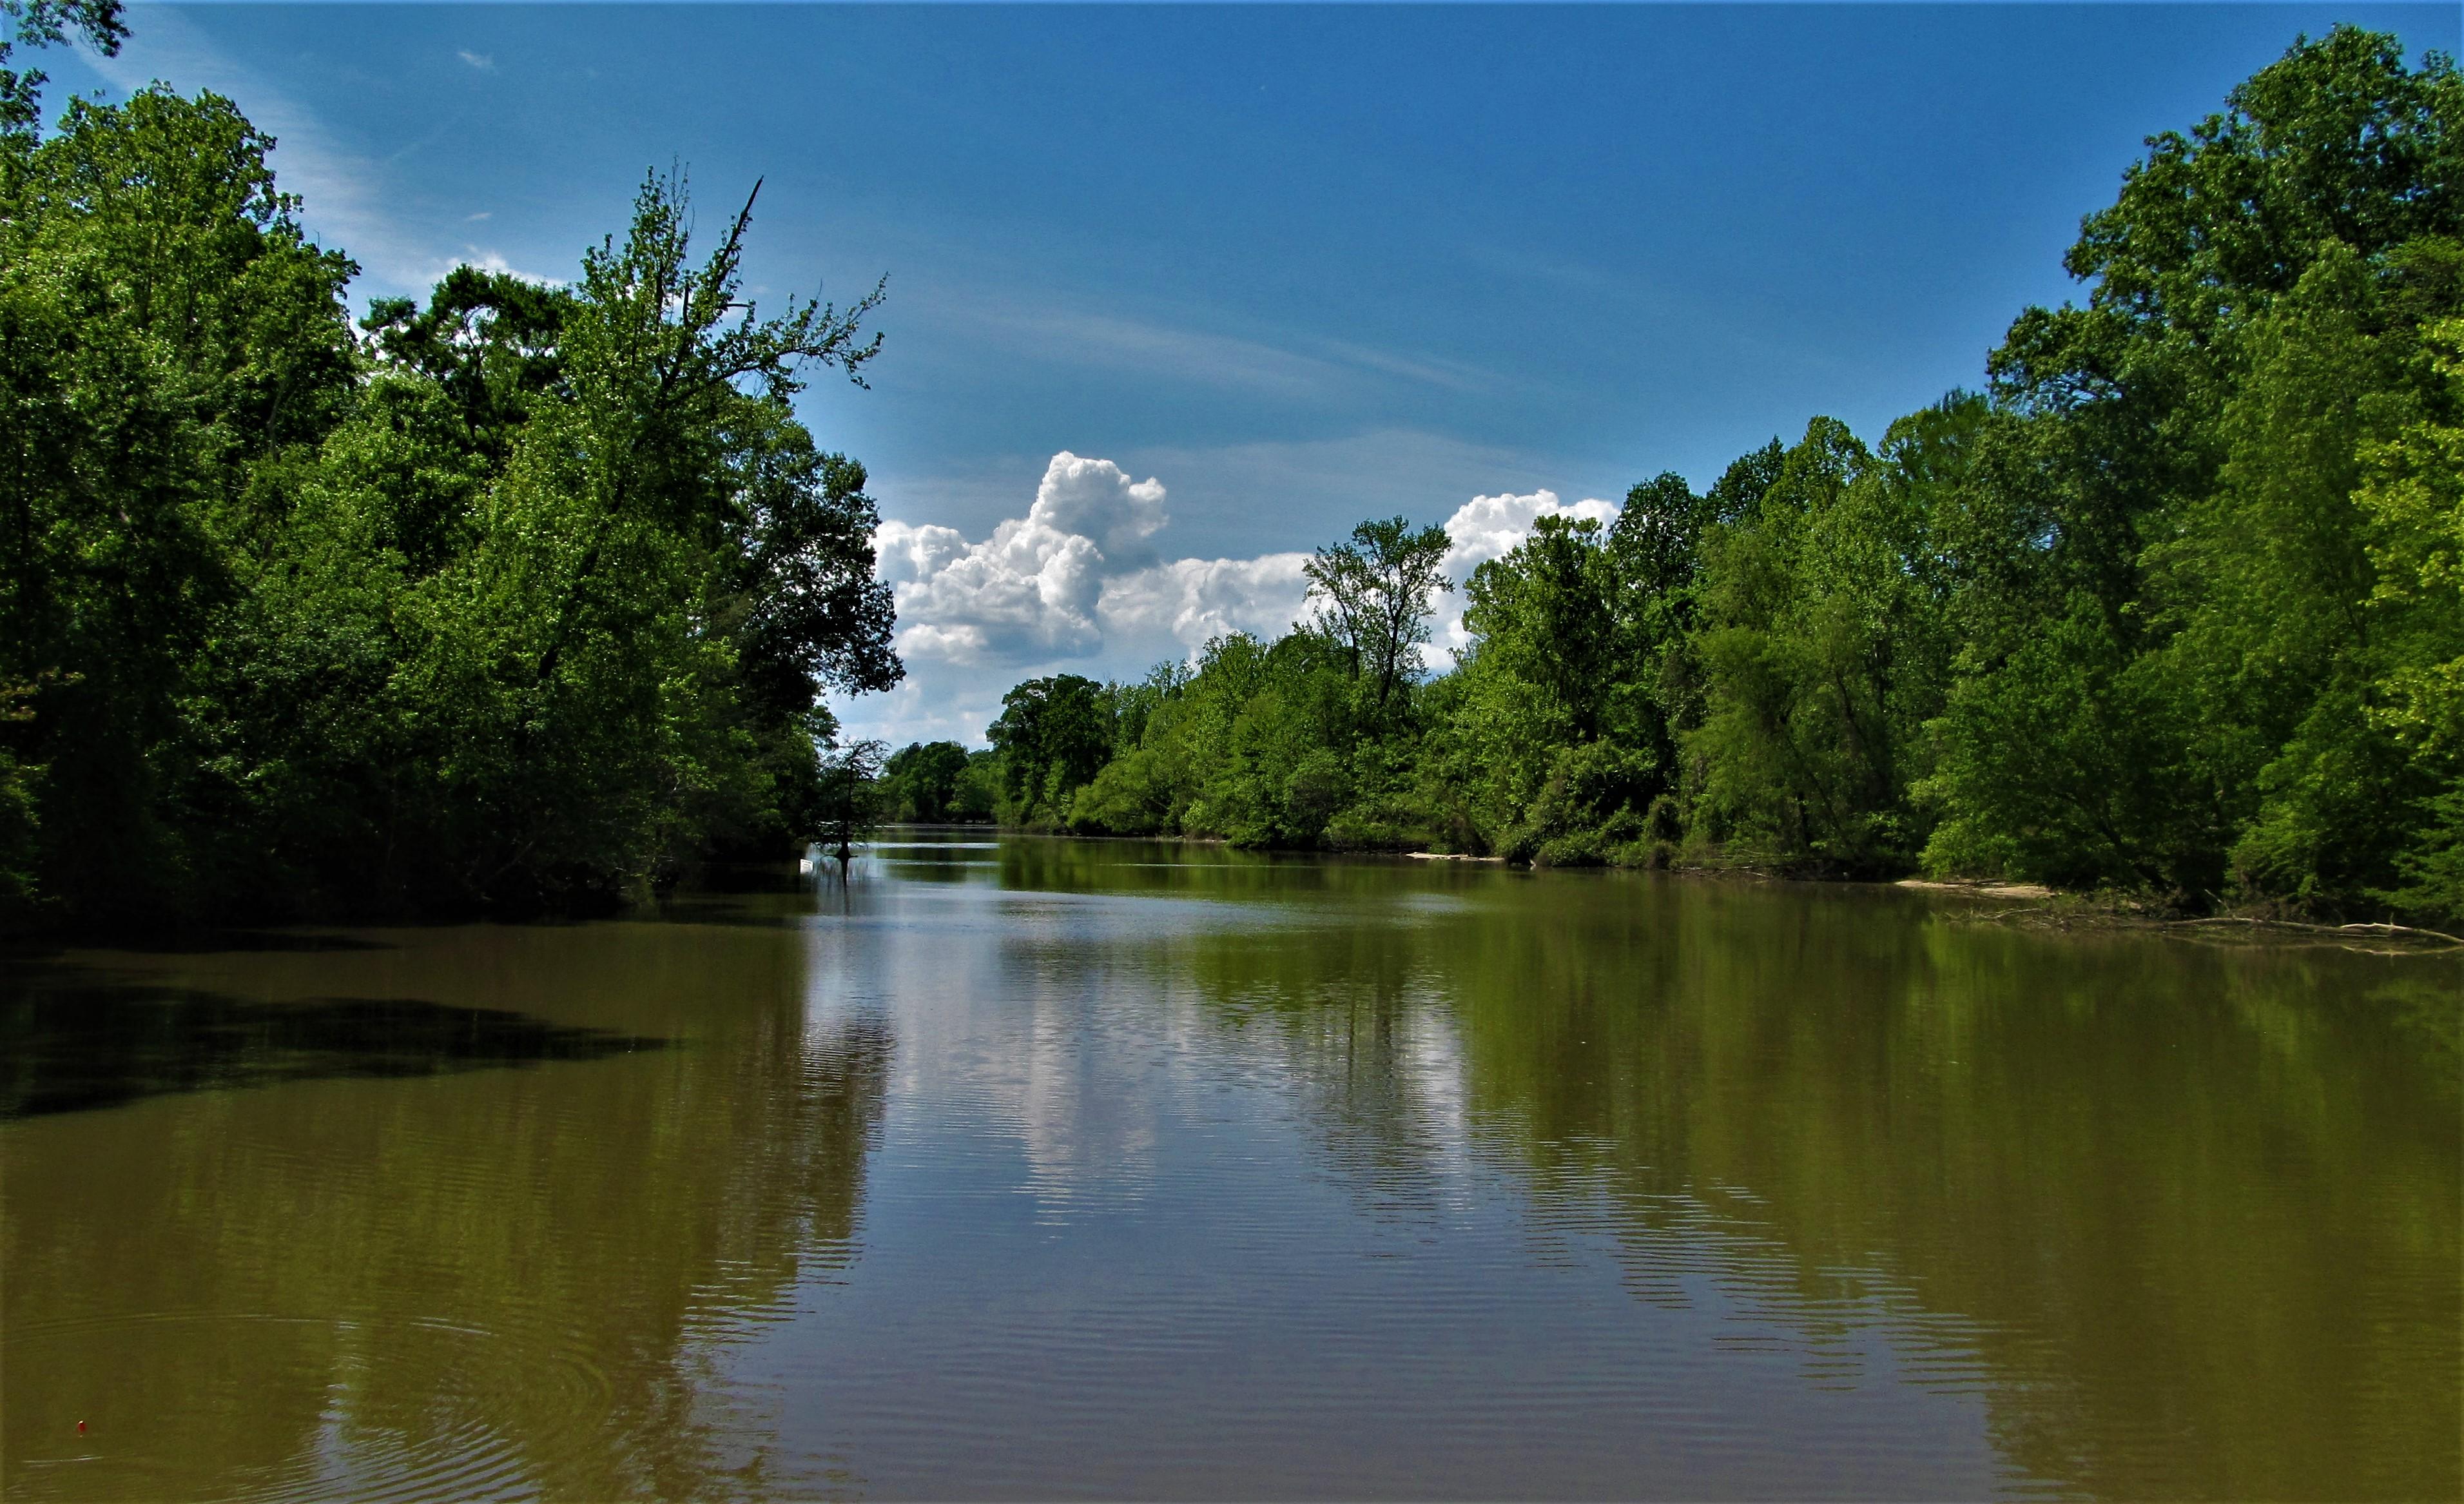 pelahatchie bay river 1 april 12